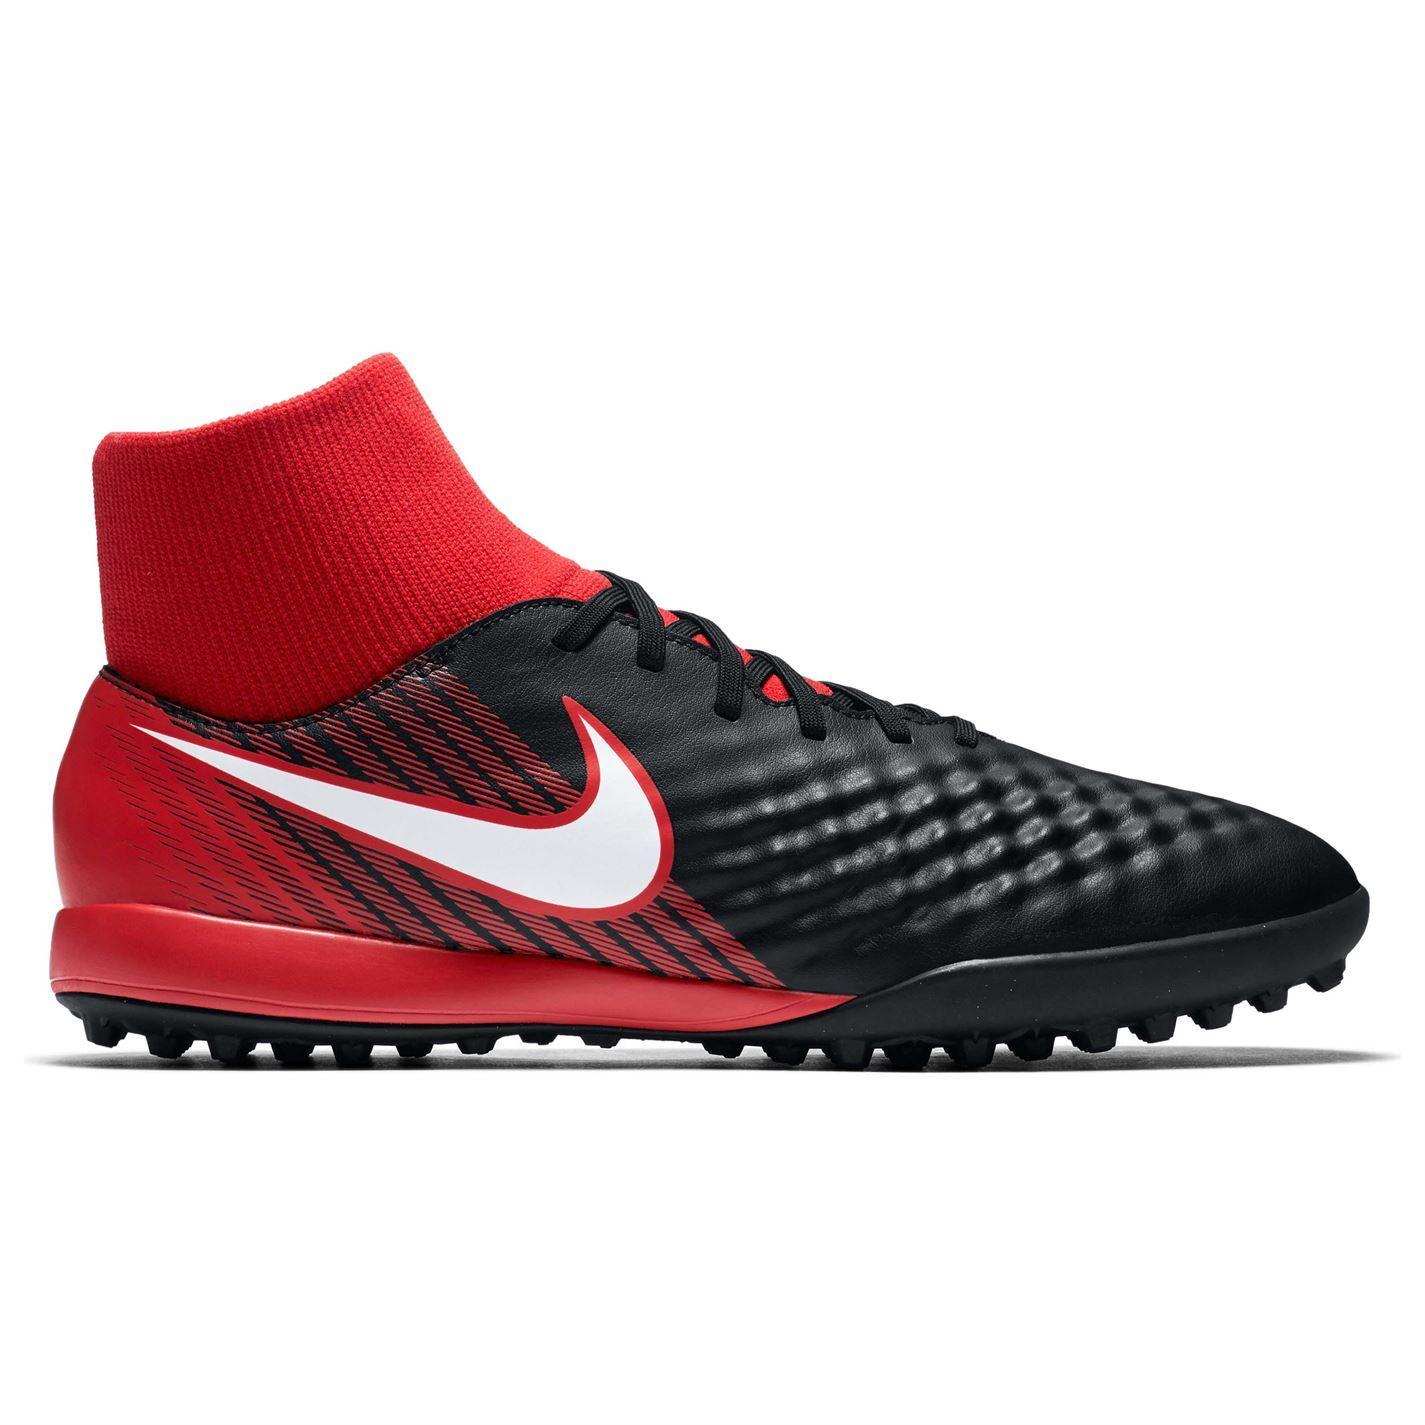 757e61b3b ... Nike Magista Onda DF Astro Turf Football Trainers Mens Black Red Soccer  Shoes ...